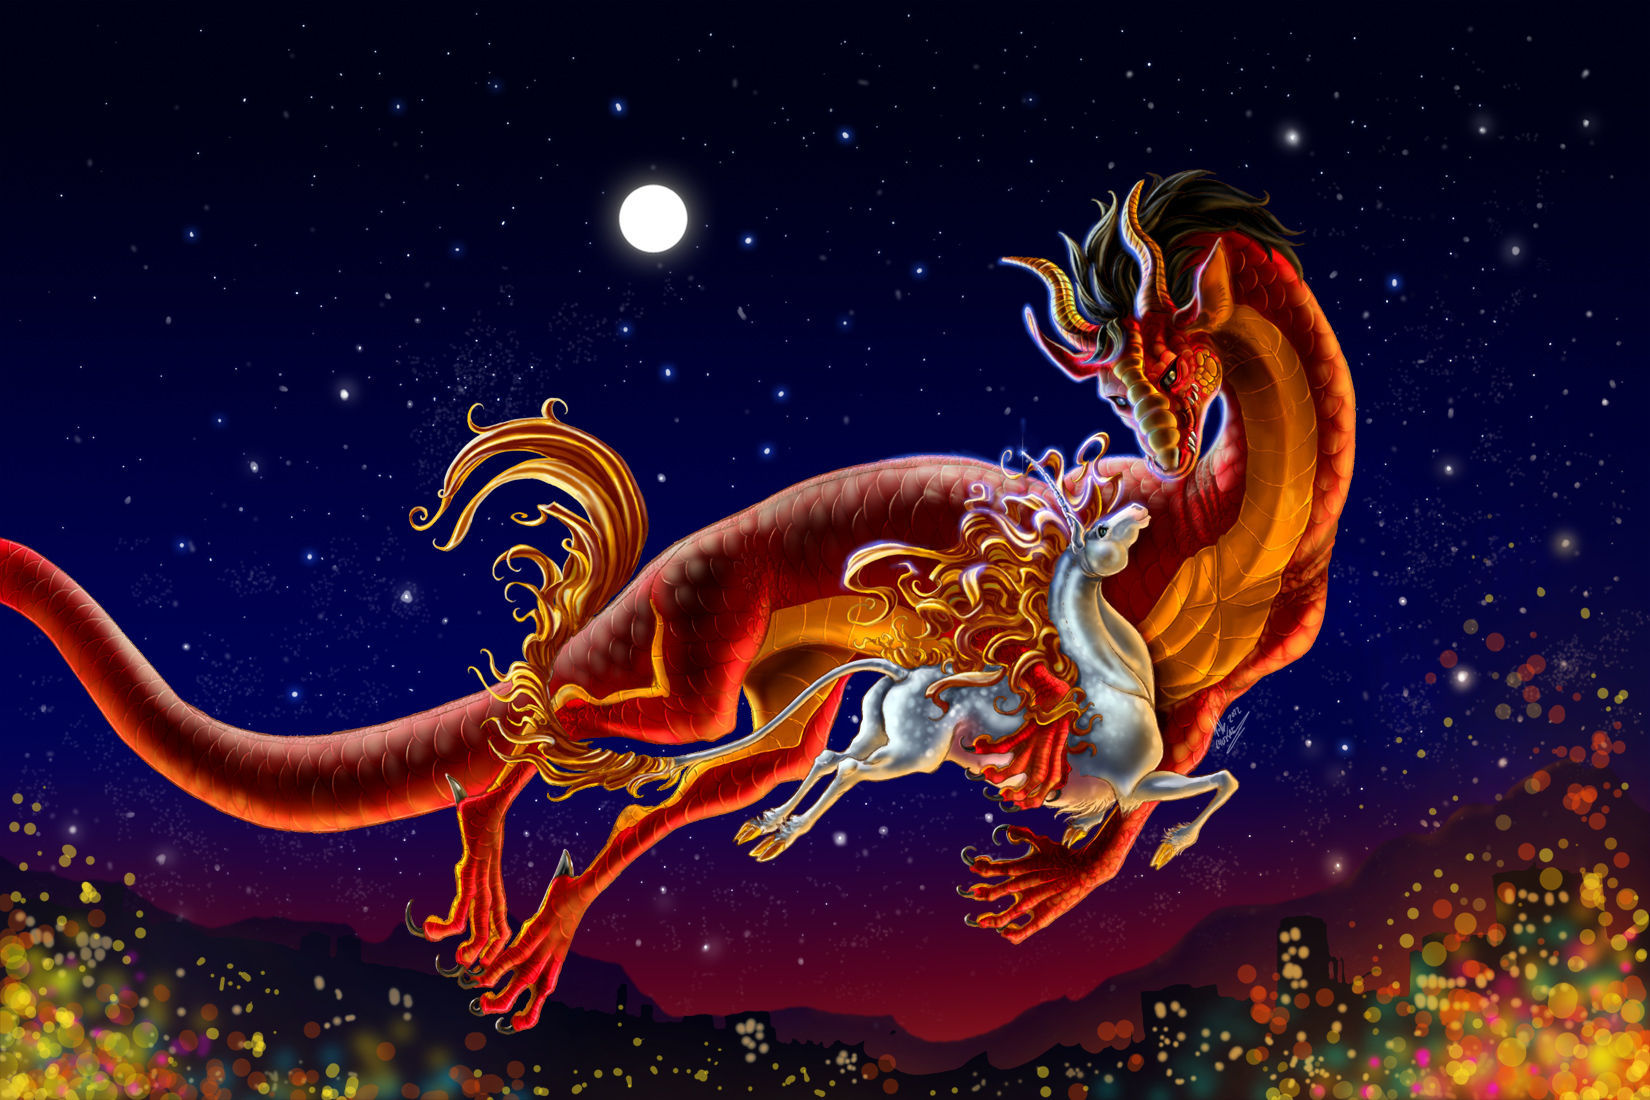 Лун ван красивый дракон картинки